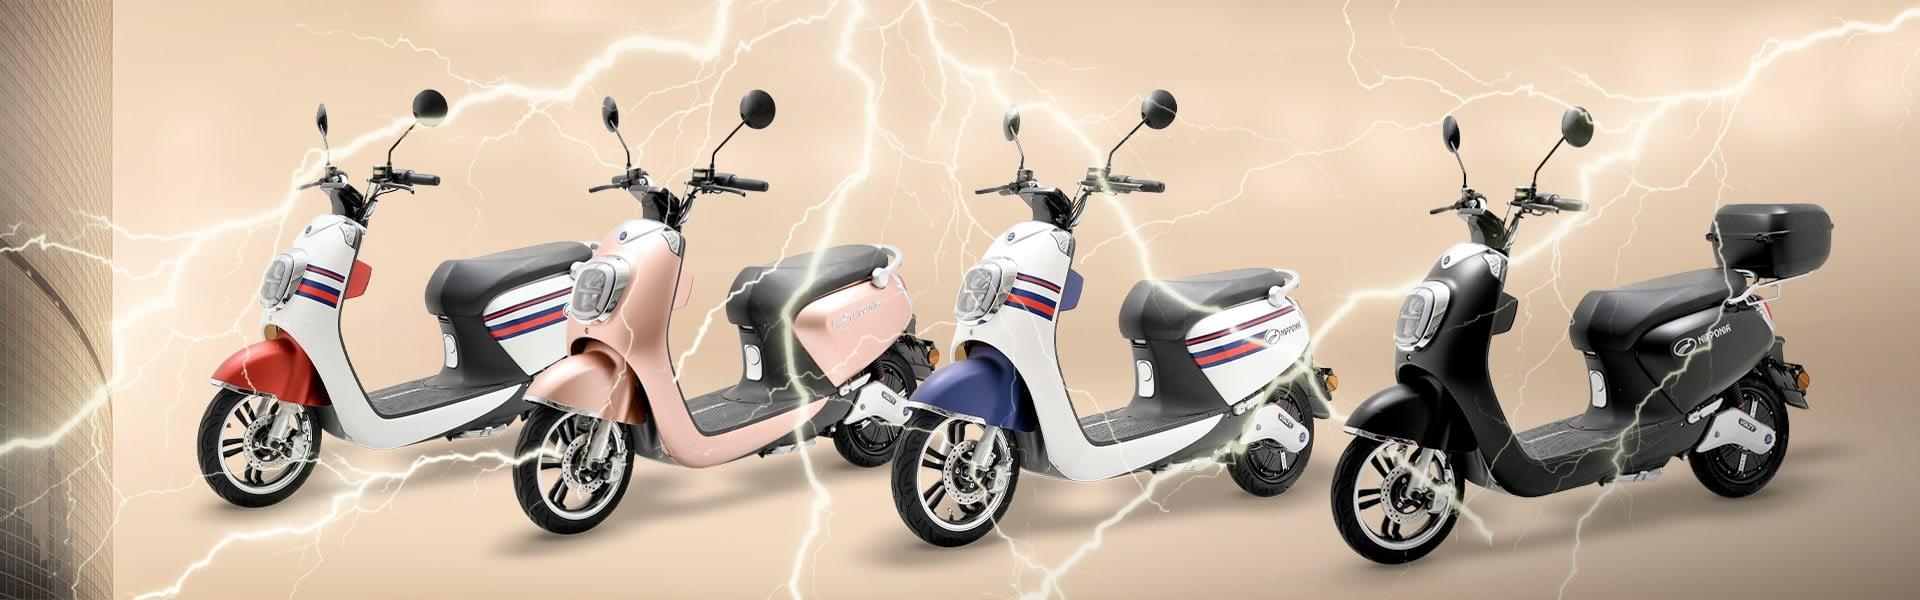 Nipponia Pasolas Electricas